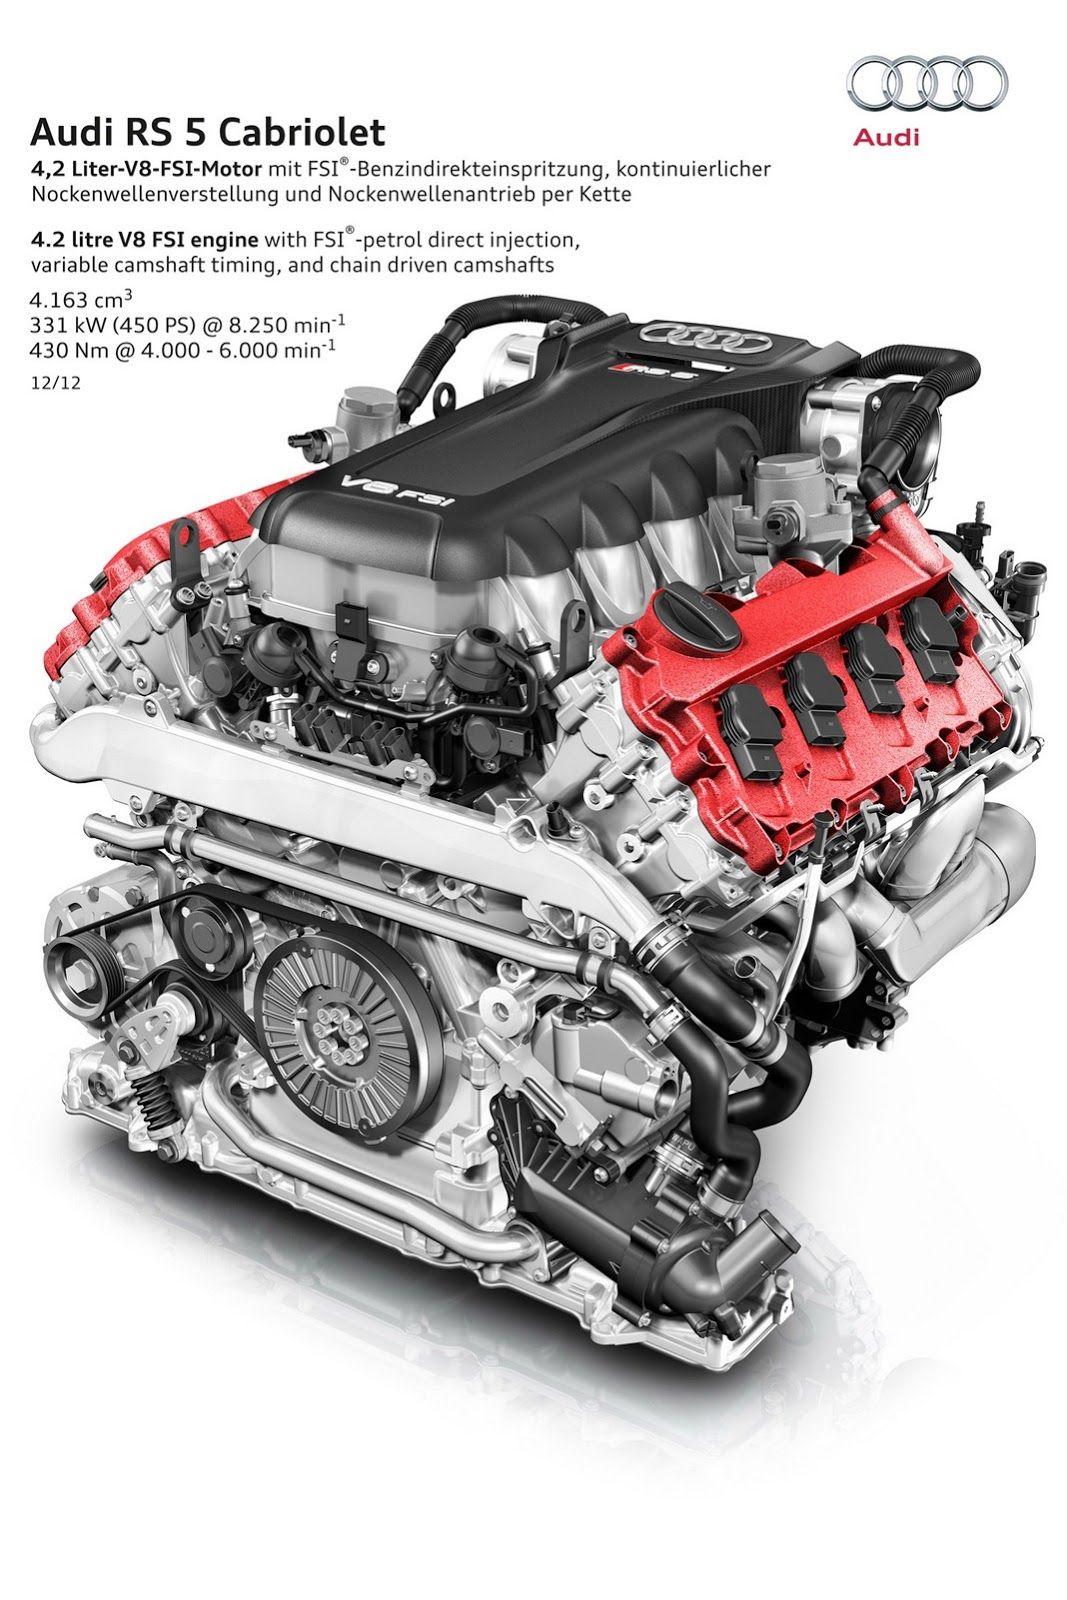 Kelebihan Audi 4.2 V8 Top Model Tahun Ini